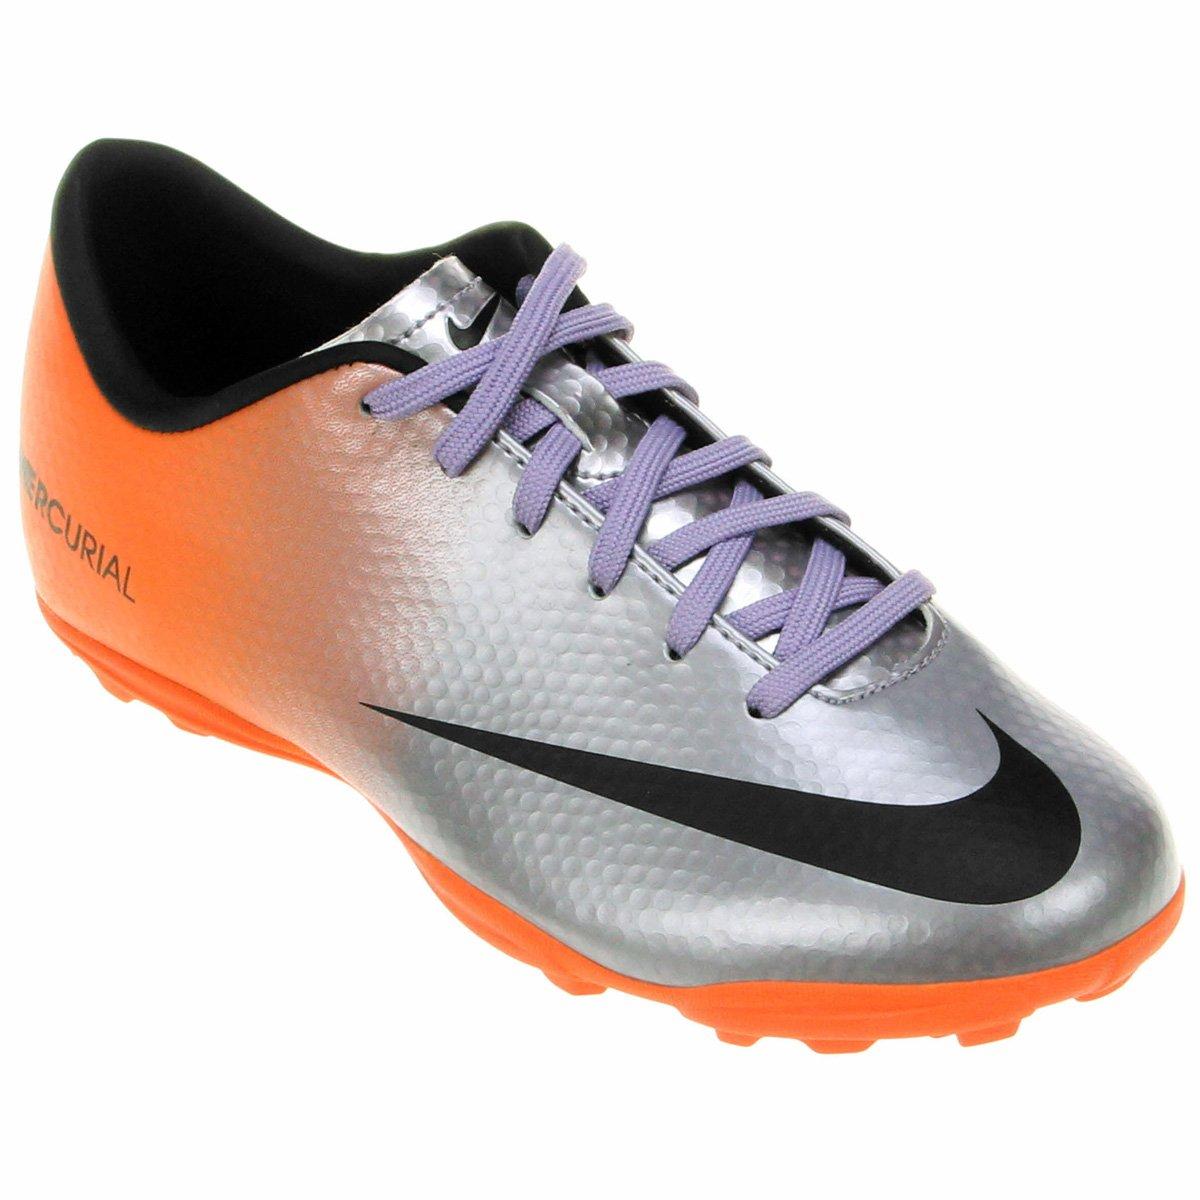 ... netherlands chuteira nike mercurial victory iv tf infantil compre agora  netshoes d70f5 114e4 165374b6c8fc1